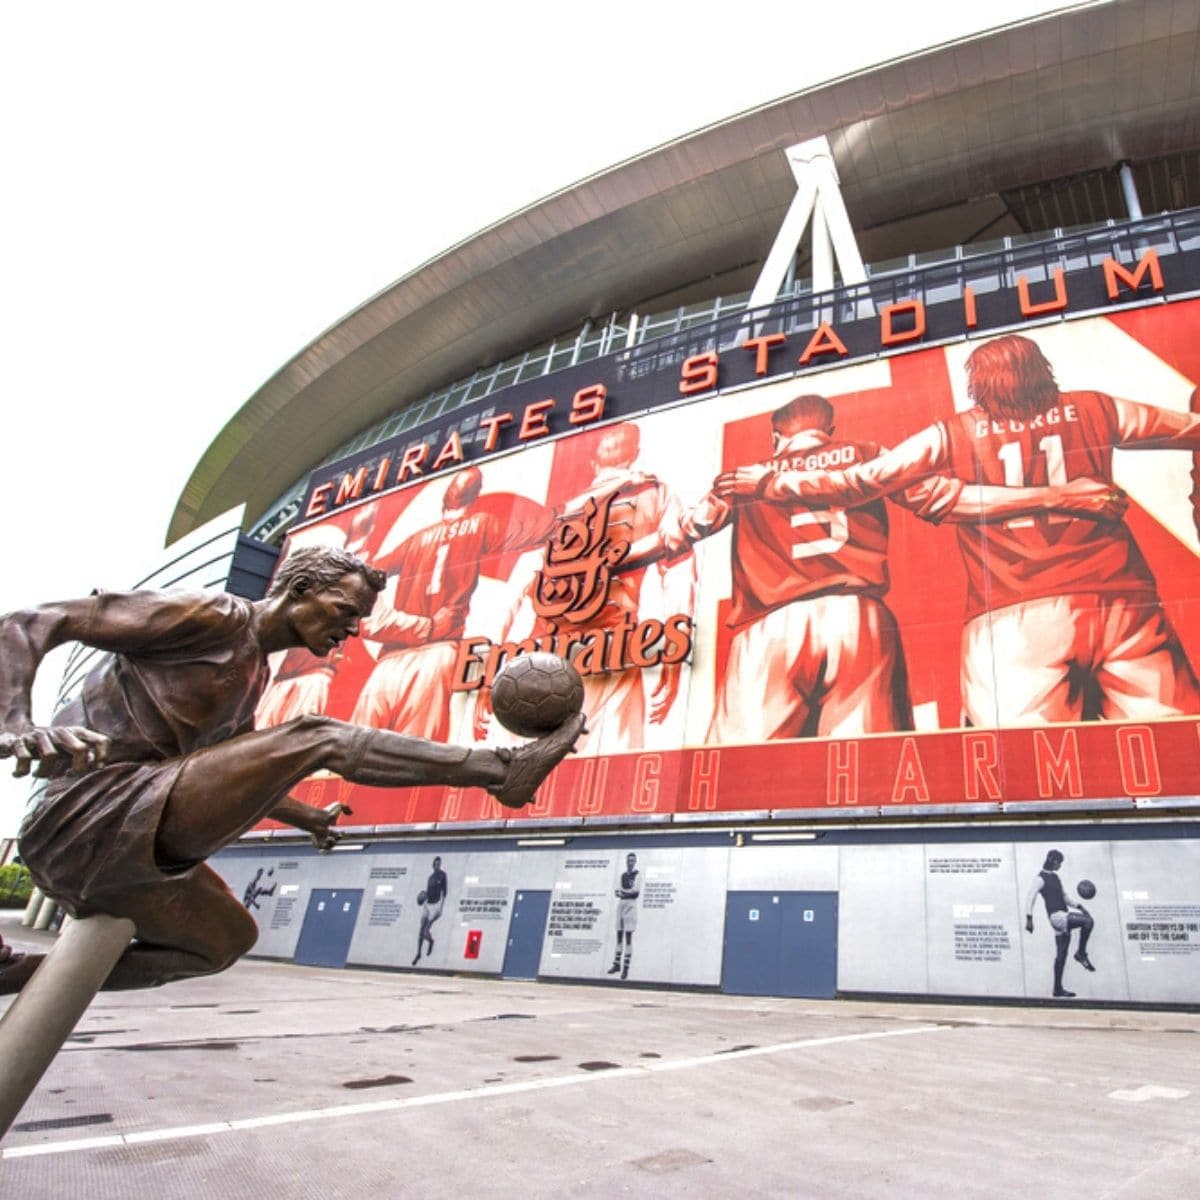 Suka Sepak Bola Ini 7 Stadion Terbaik di Inggris yang Wajib Kamu Kunjungi - Emirates Stadium London